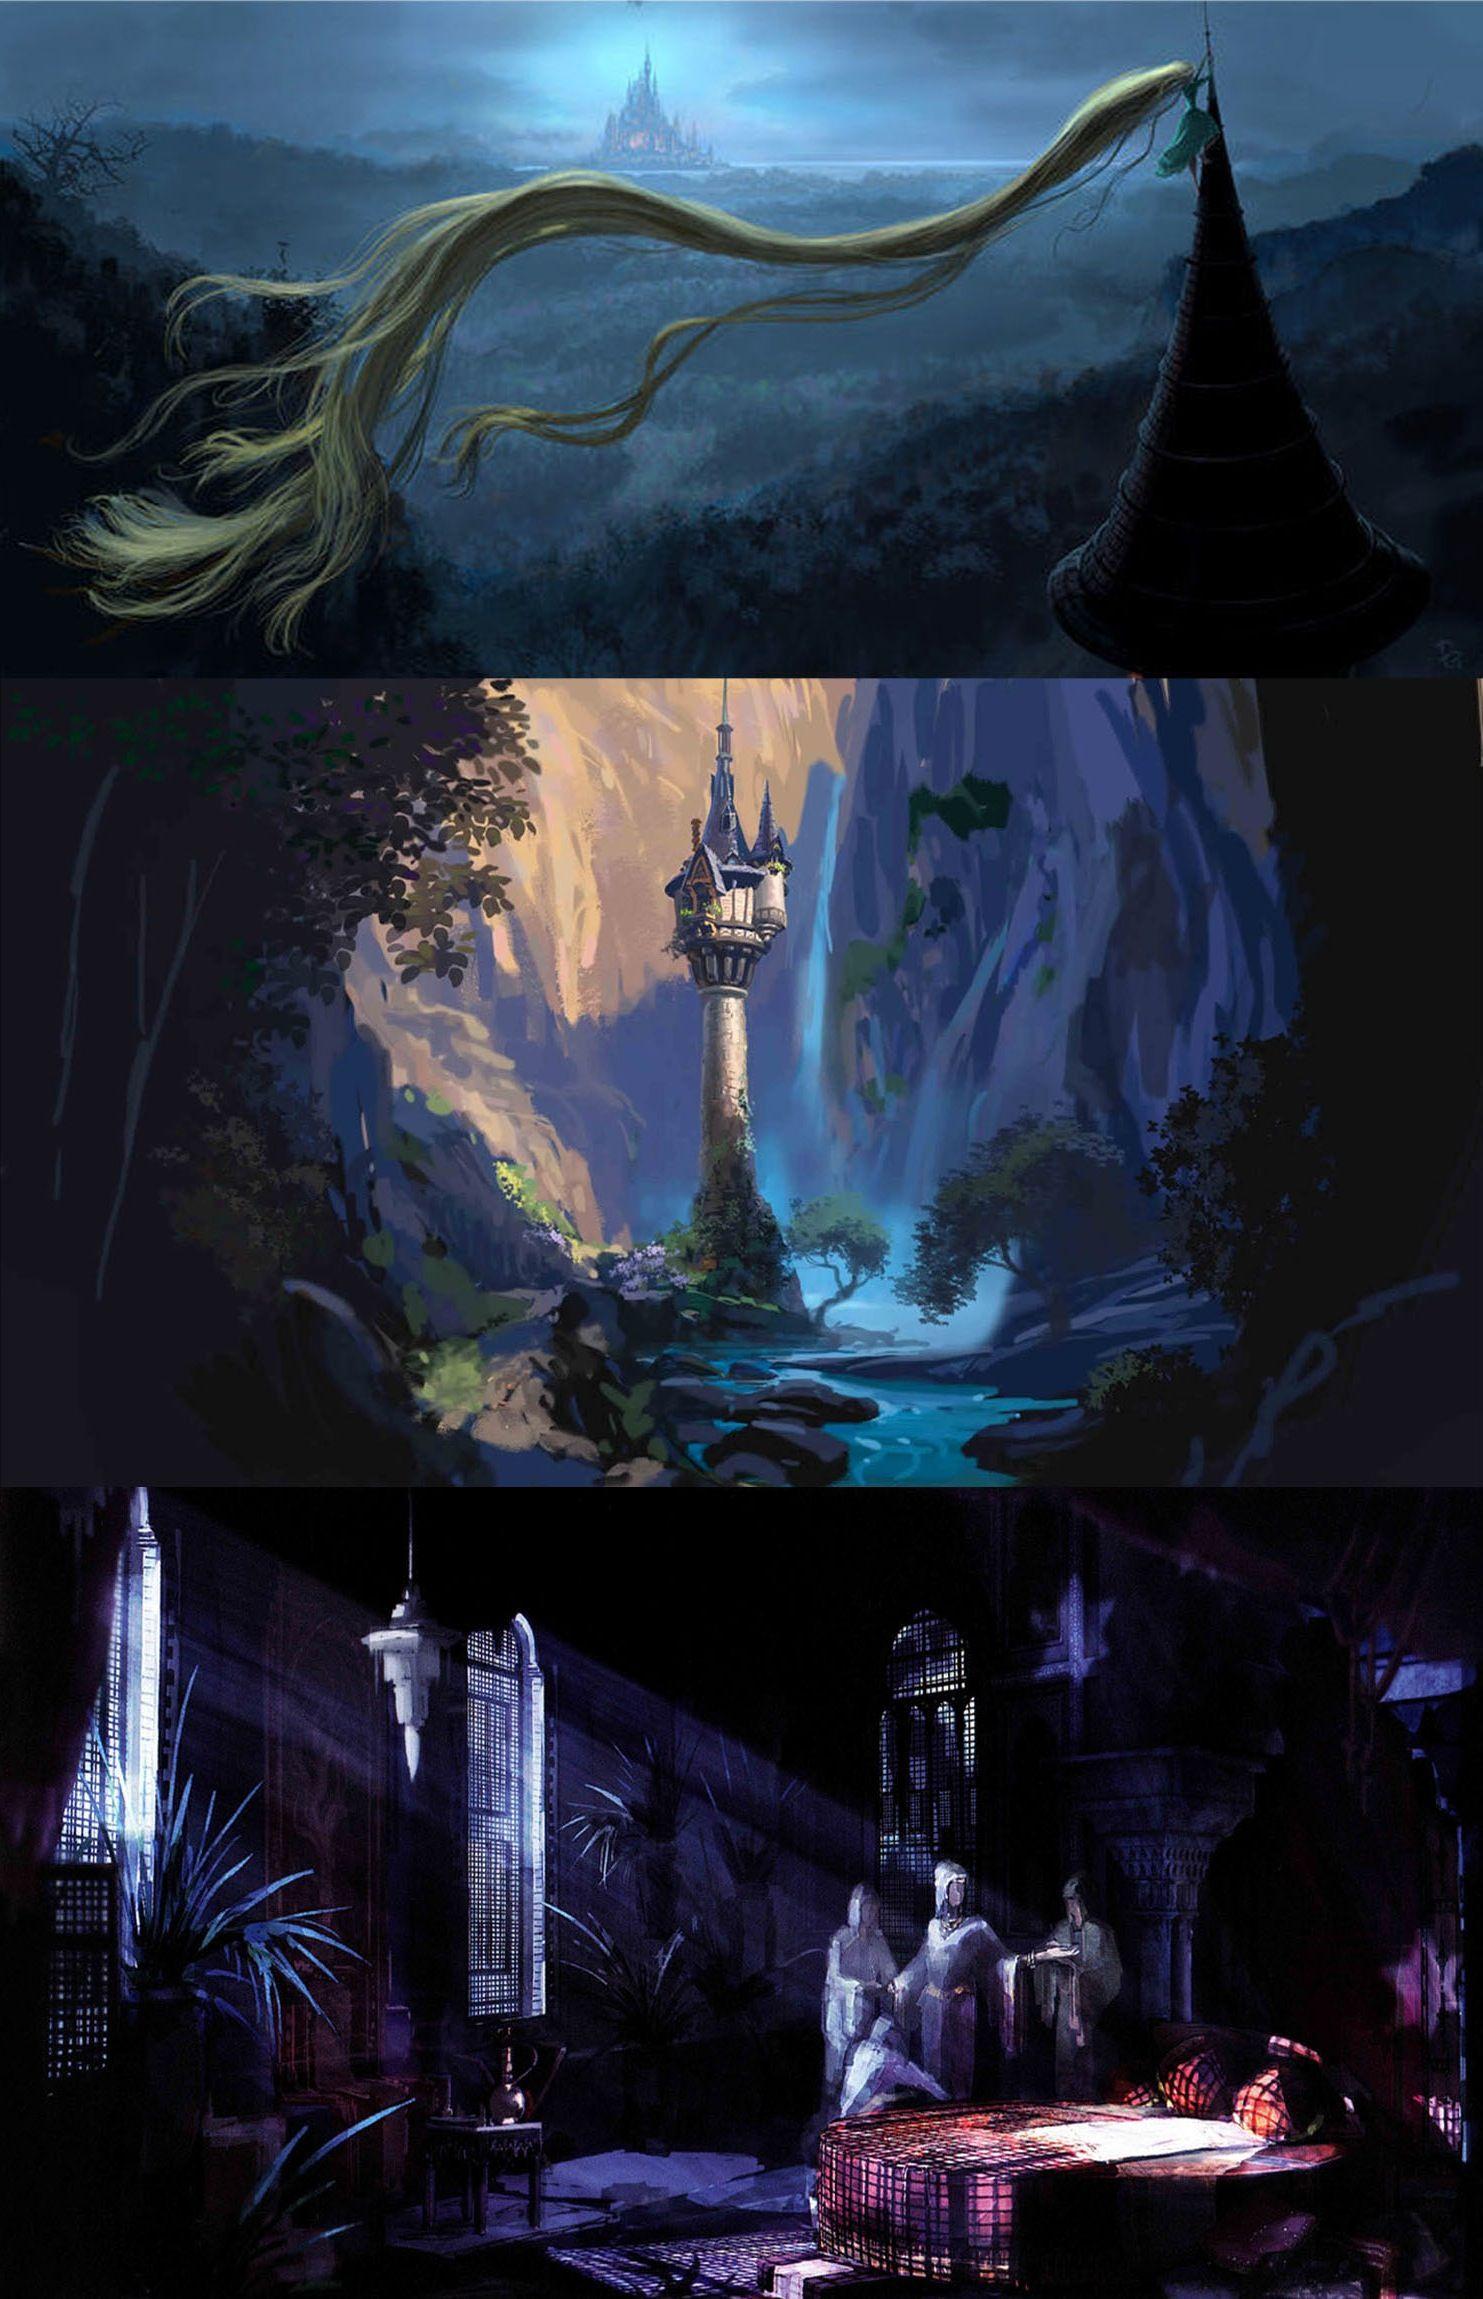 Pre-movies Artwork for Walt Disney's movies